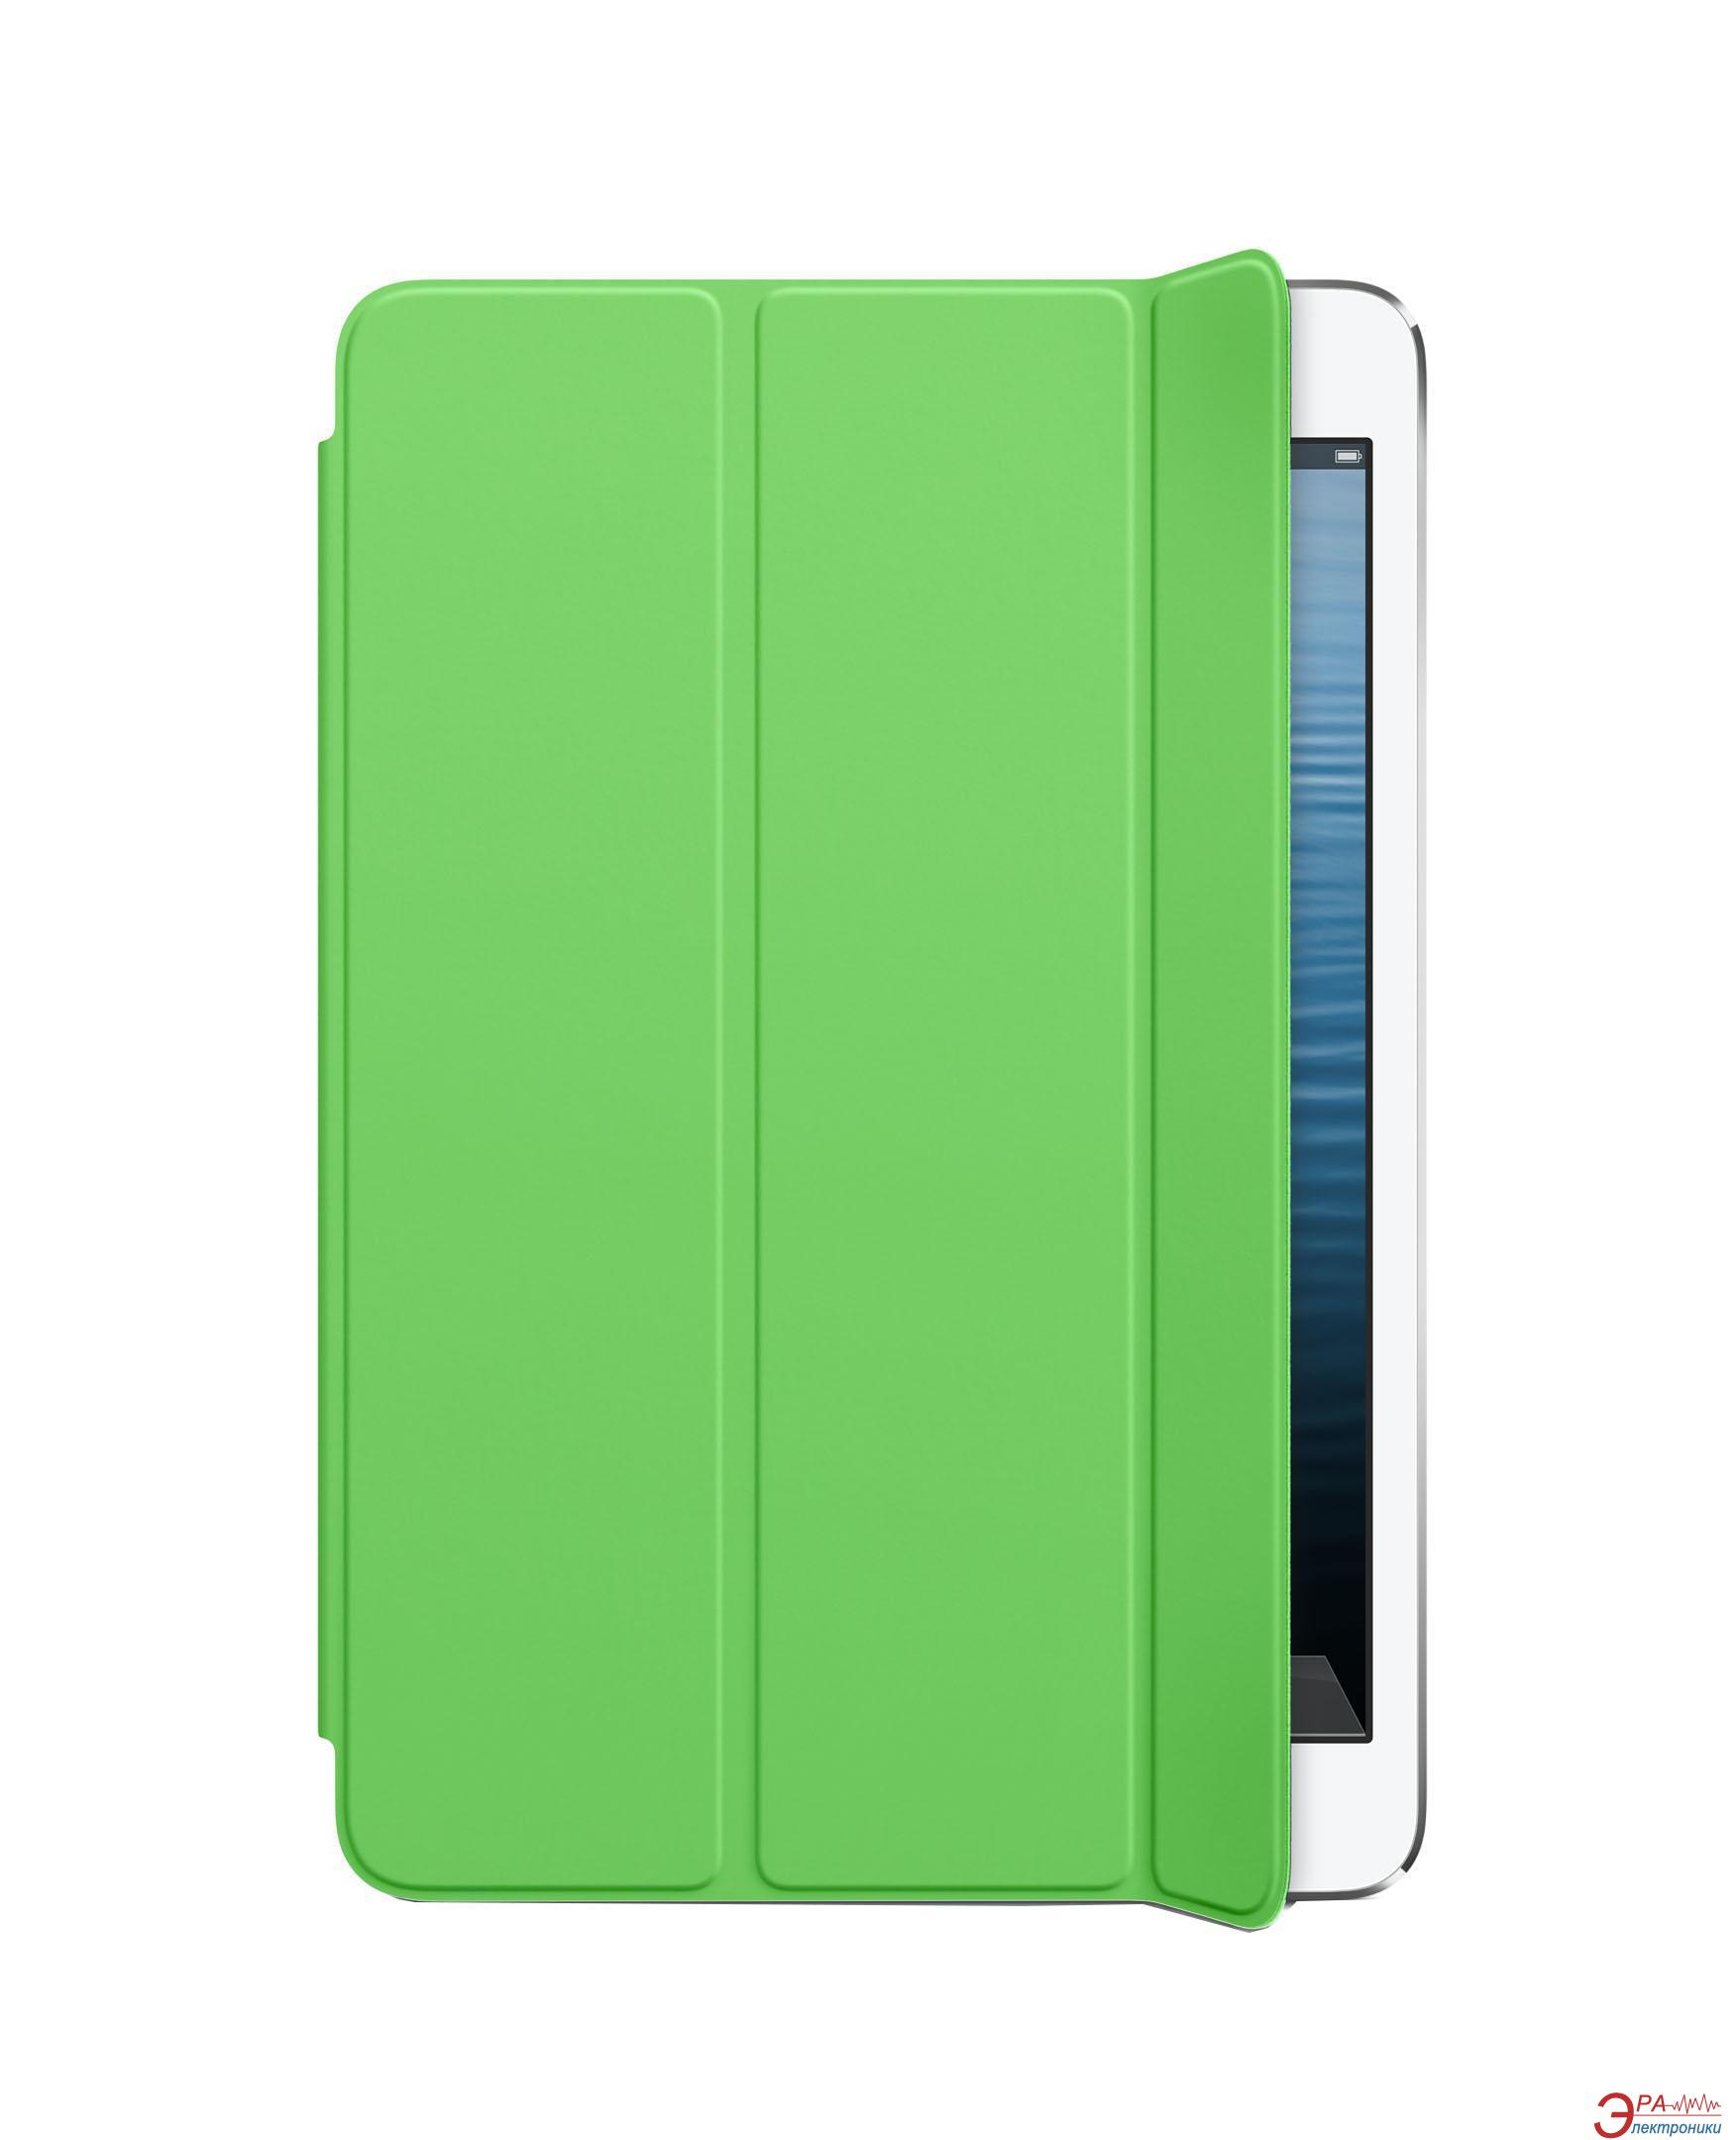 Чехол-подставка Apple Smart Cover для iPad mini (green) (MF062ZM/A)